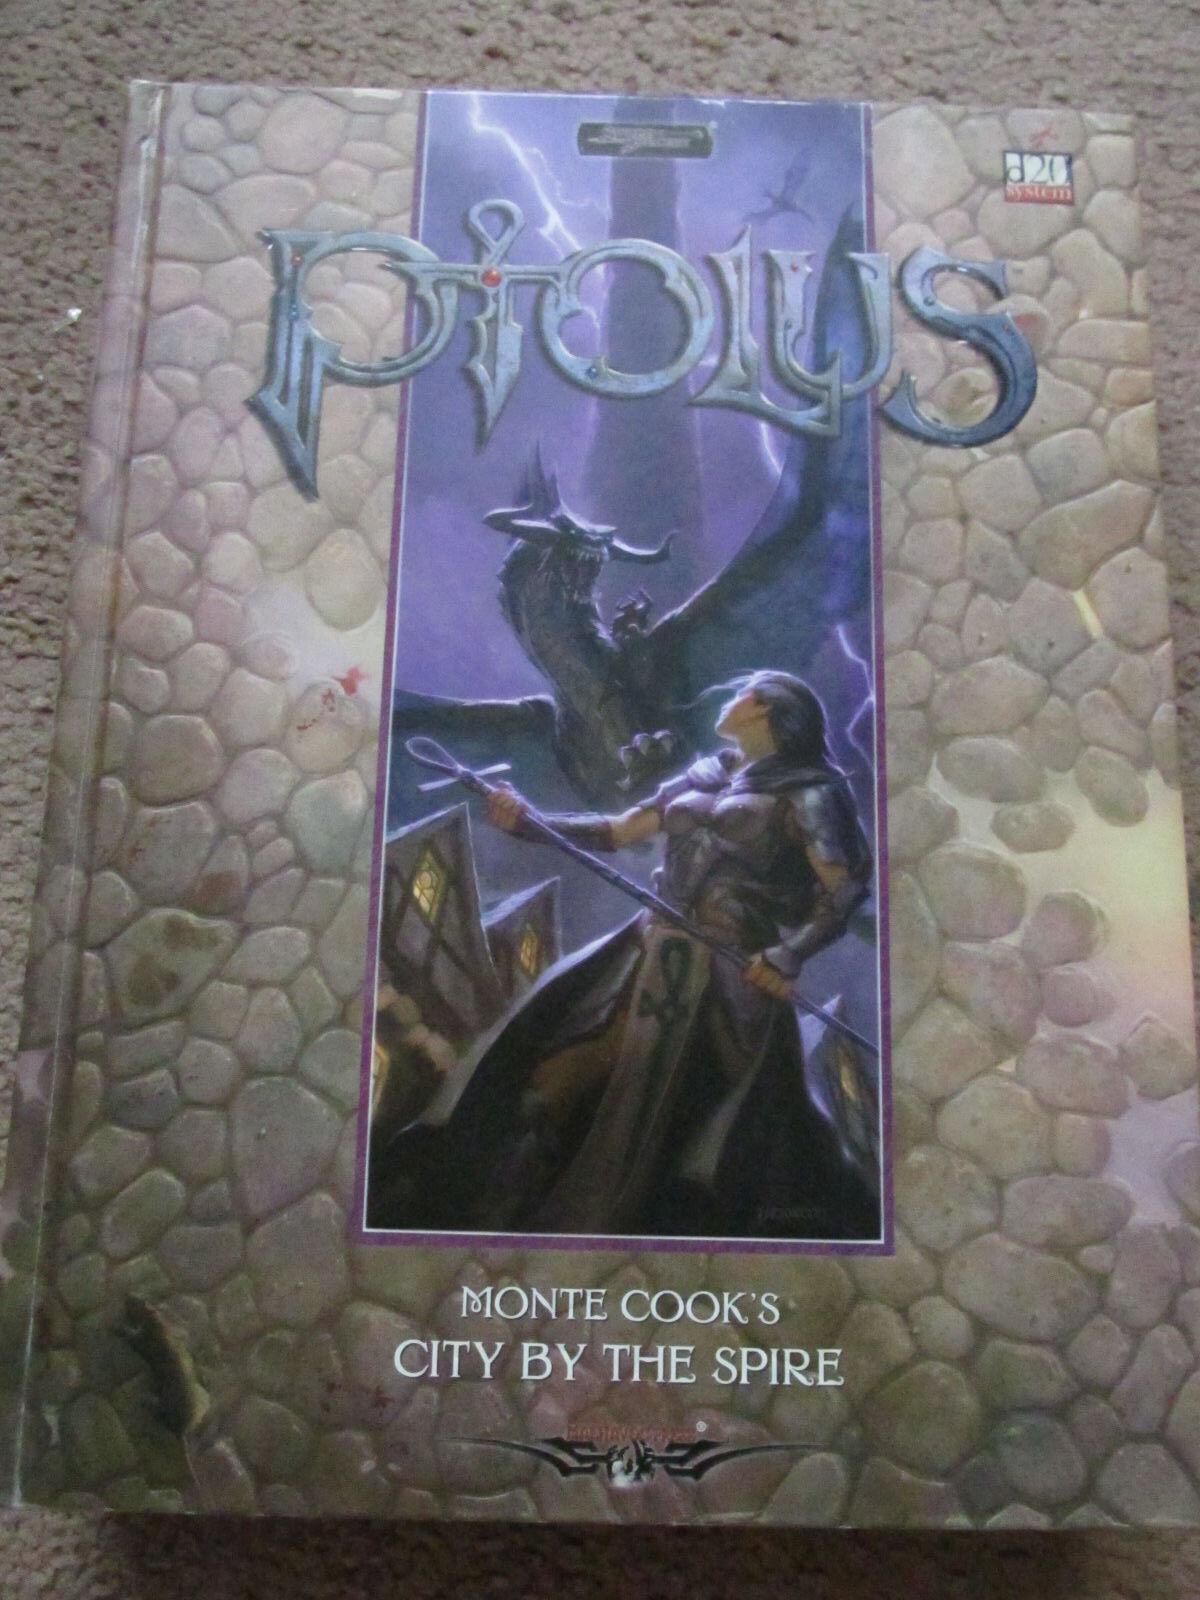 PTOLUS CITY BY THE SPIRE MONTE COOKE D20 3E 3.5E 4E WW16114 S&S SWORD & SORCERY